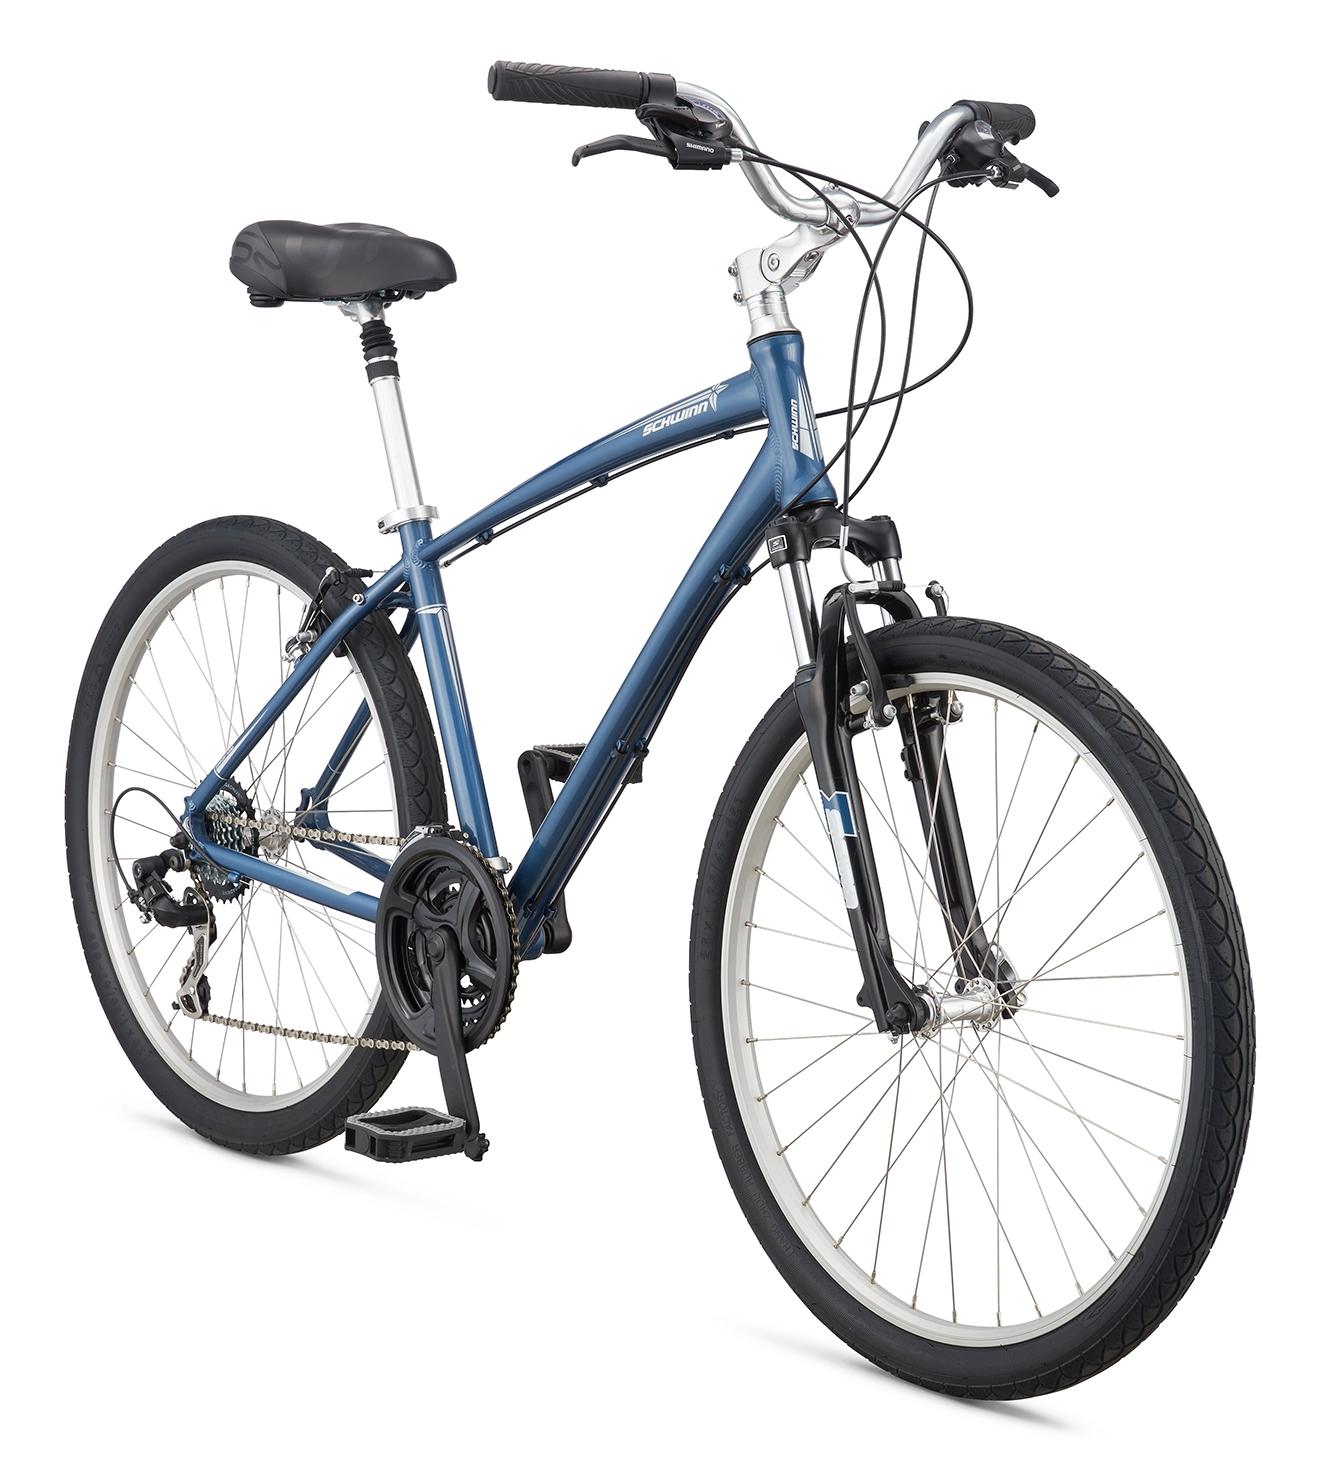 Car Transport Reviews >> 2018 Schwinn Sierra Urban Bike